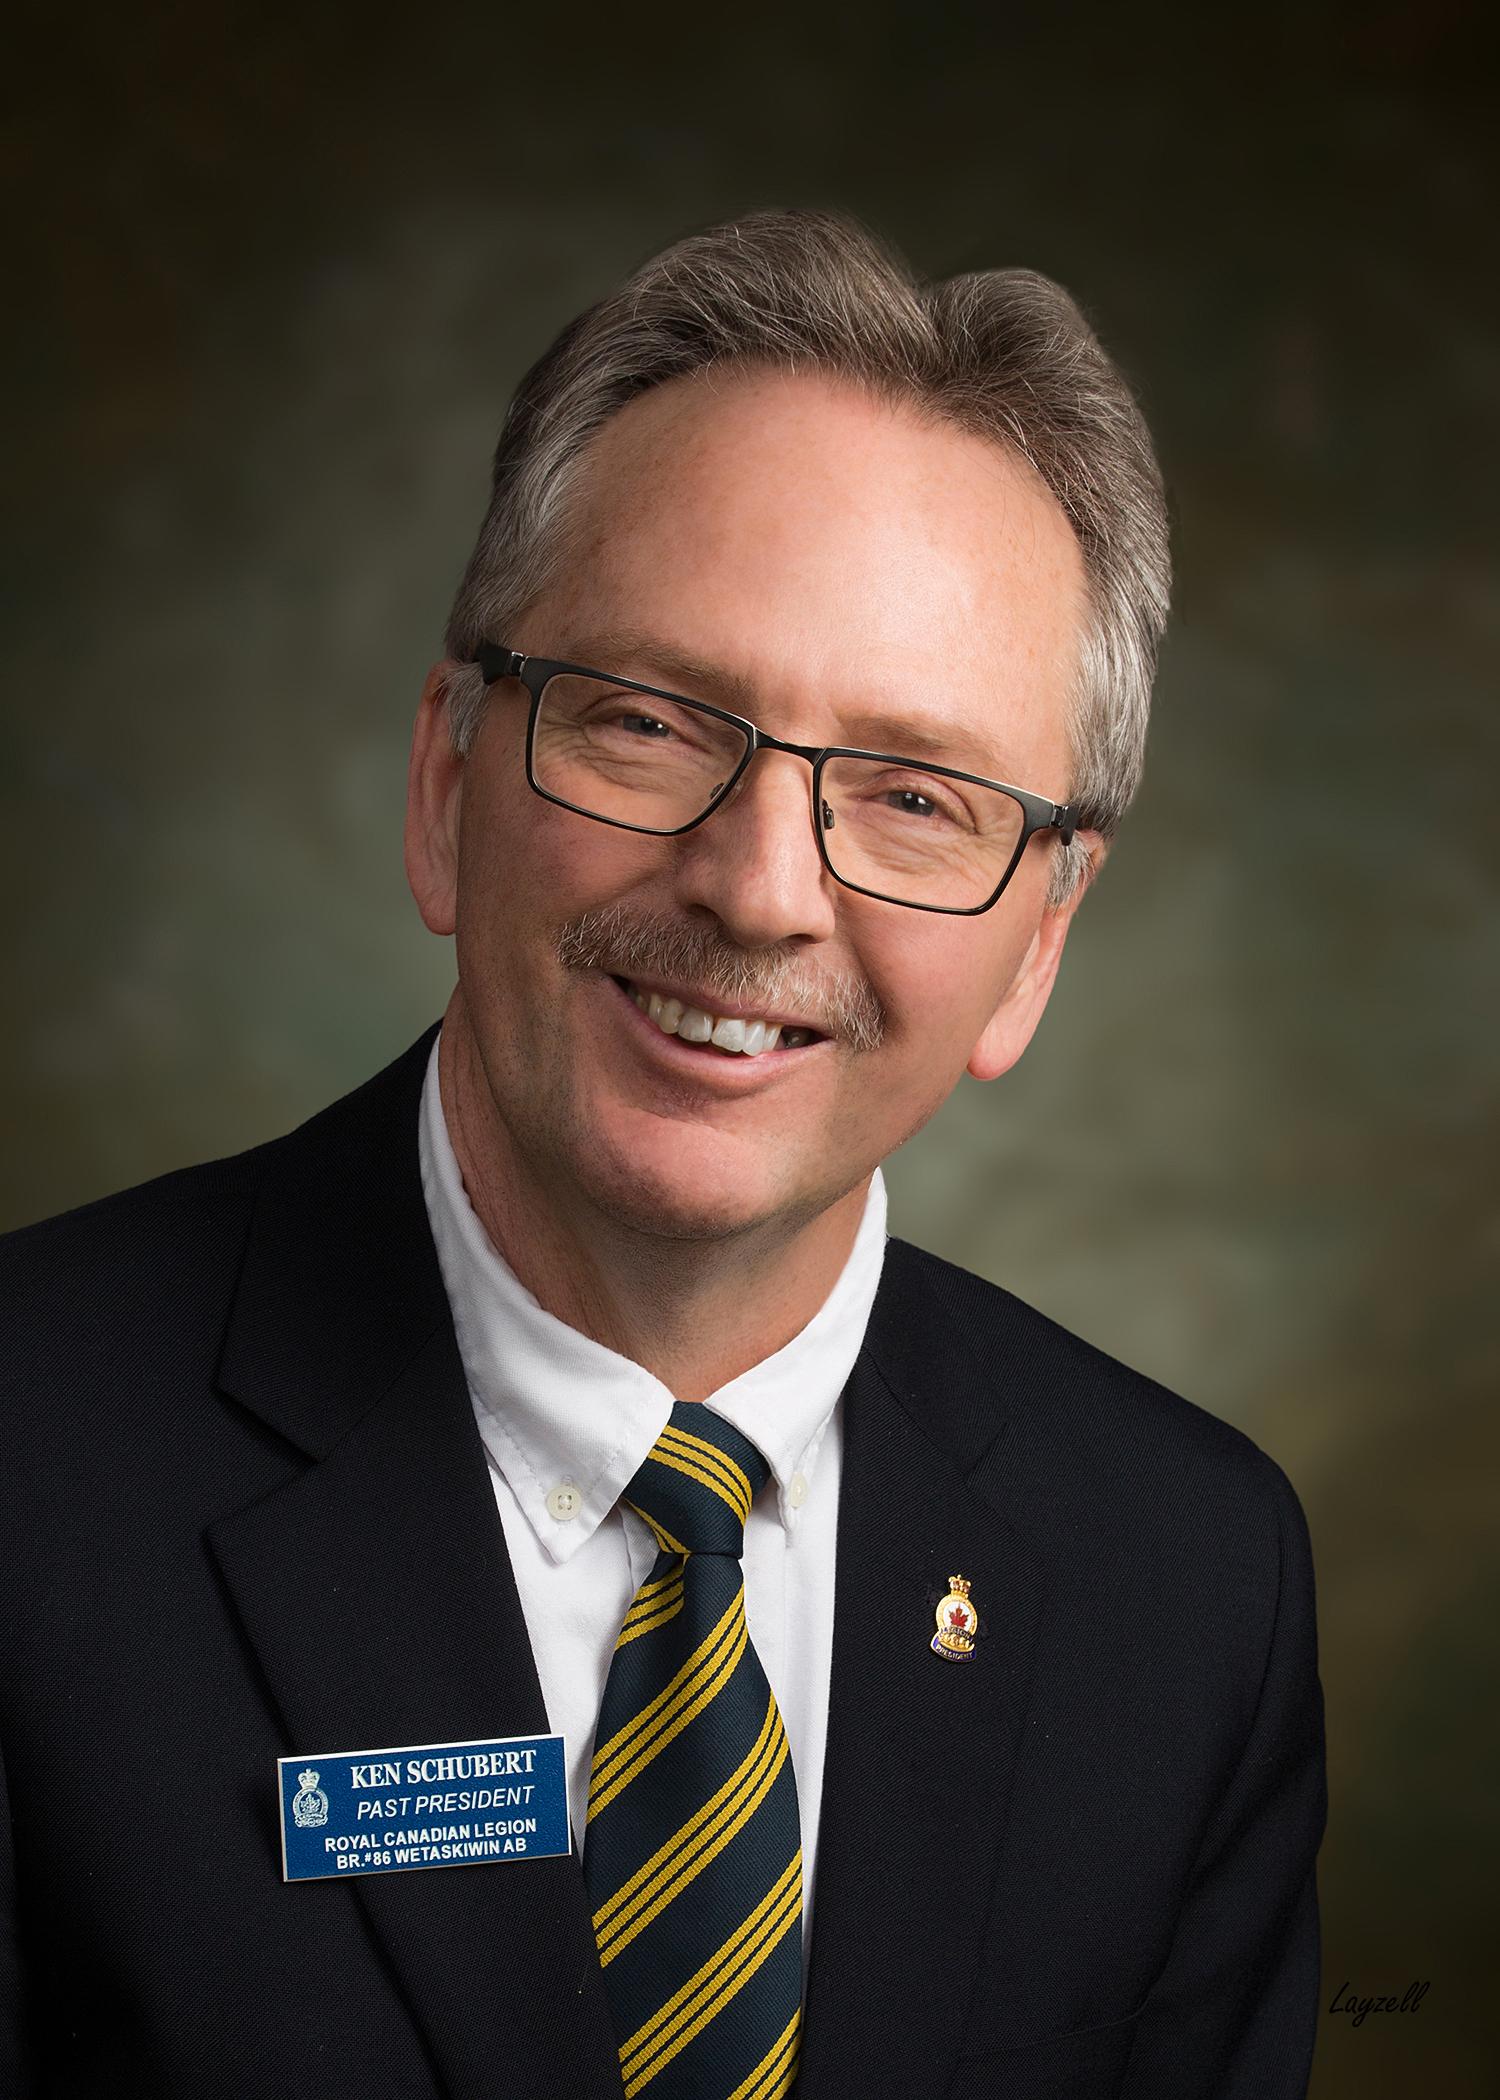 Past President - Ken Schubert